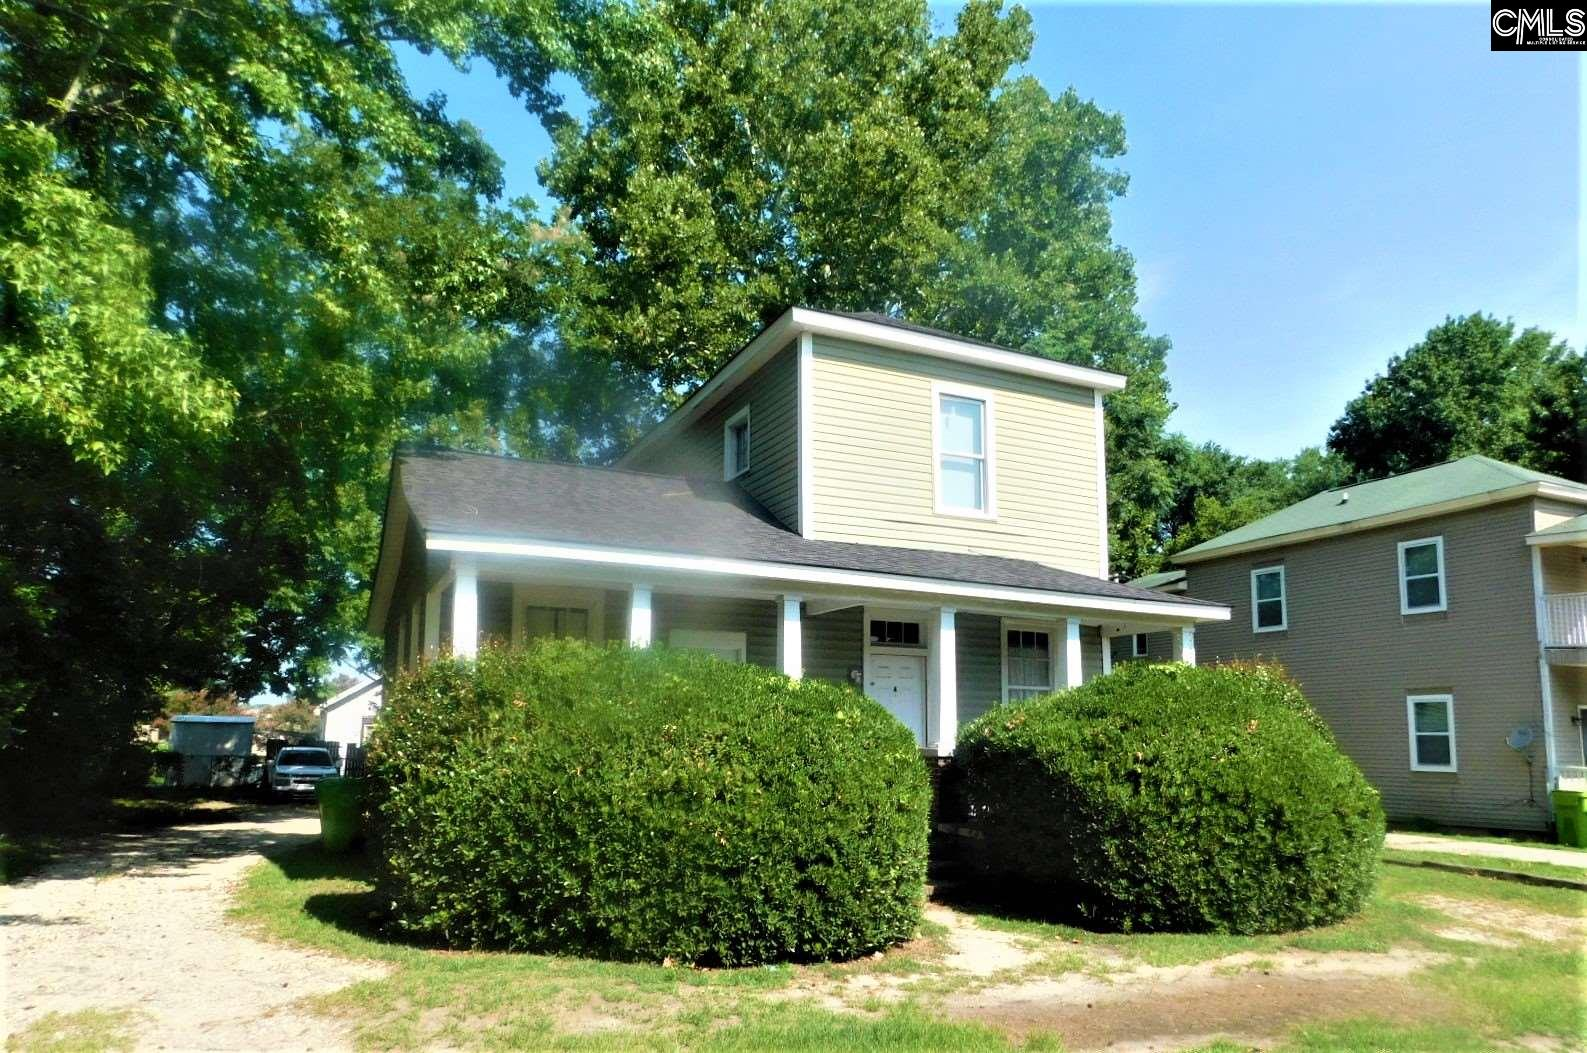 635 Kentucky Columbia, SC 29201